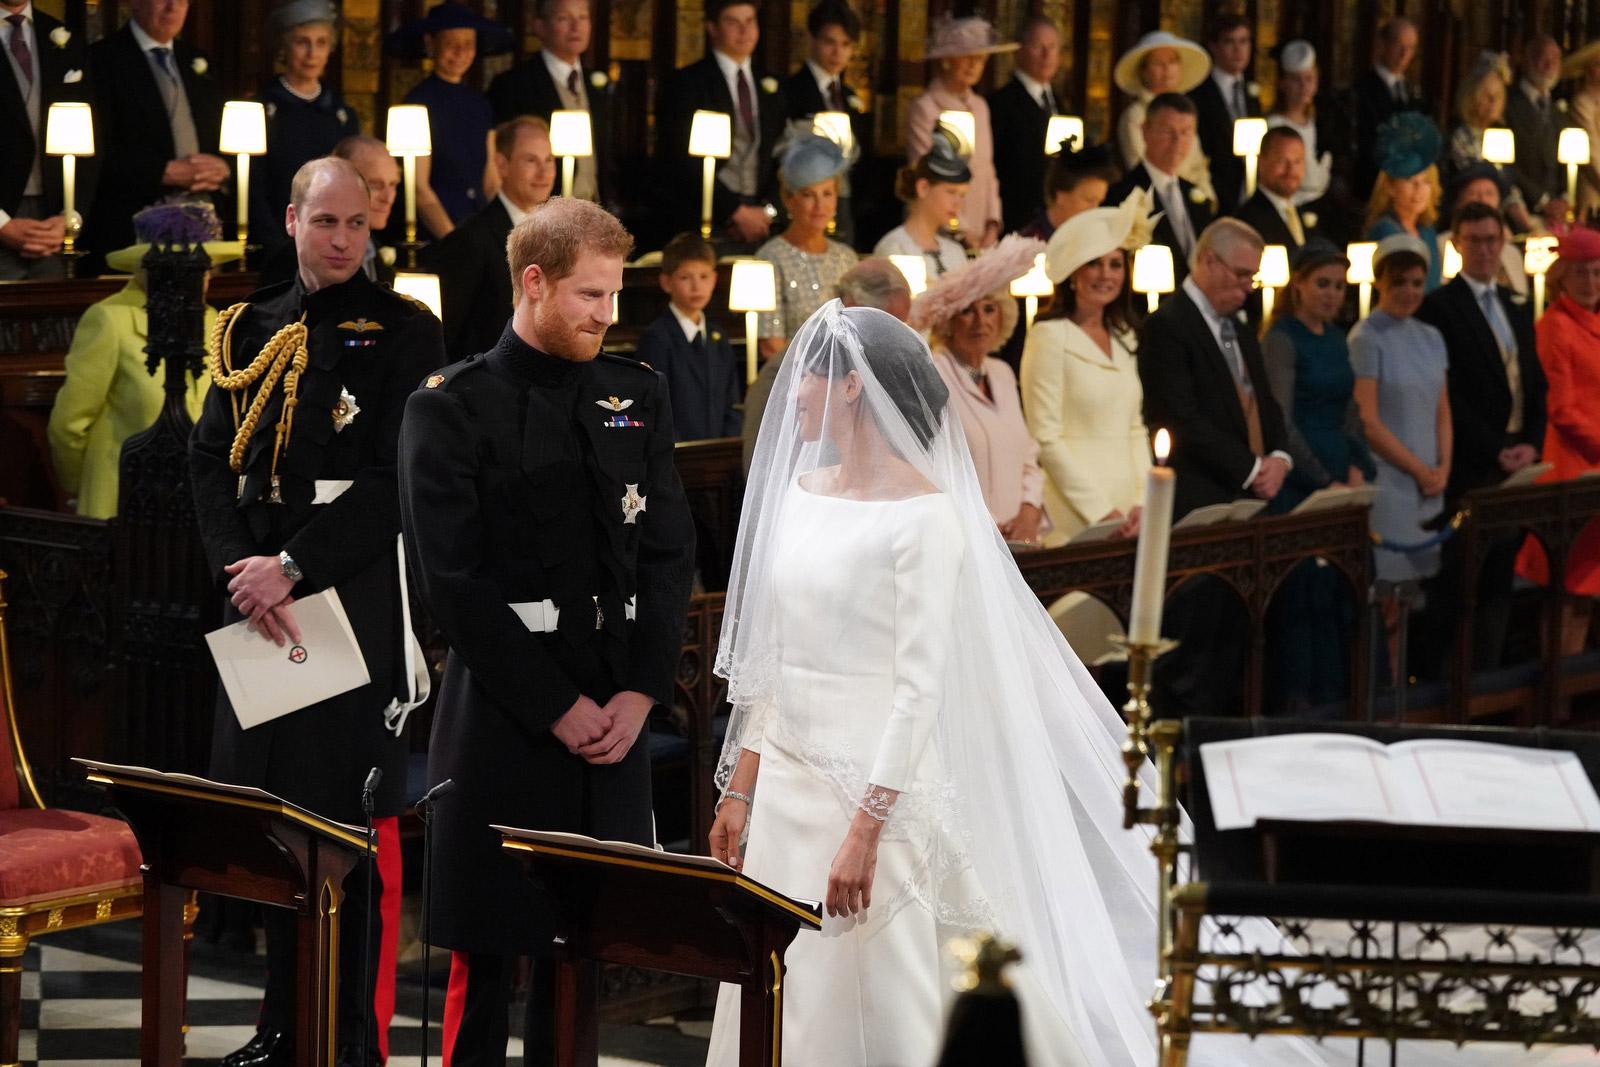 Royal Wedding Photos 2018.The Royal Wedding In Pictures Cnn Com